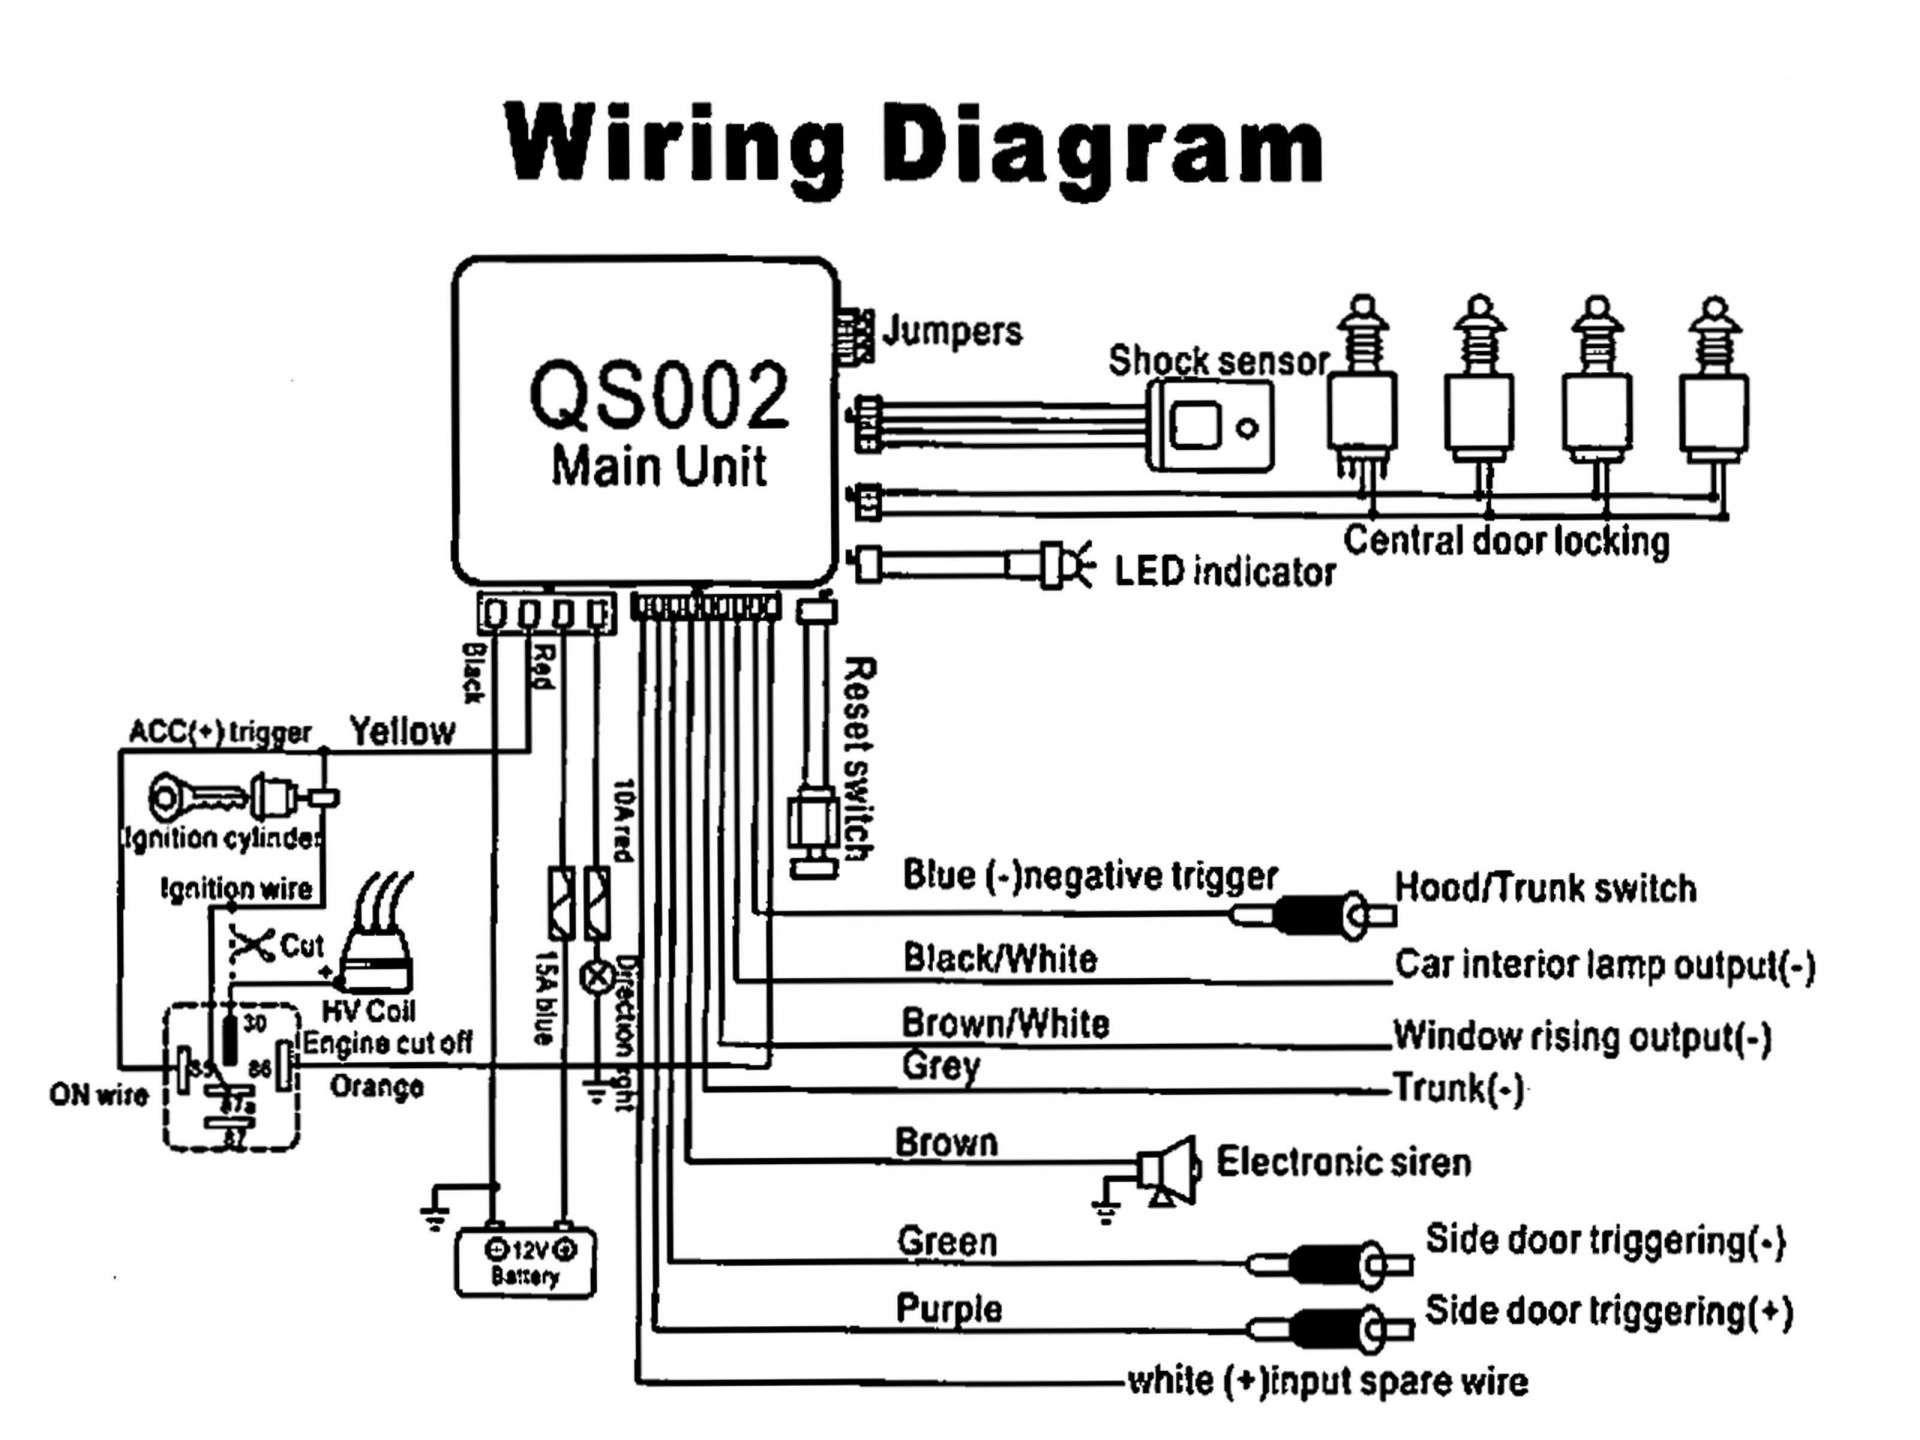 17+ Car Alarm Circuit Wiring Diagramcar alarm circuit